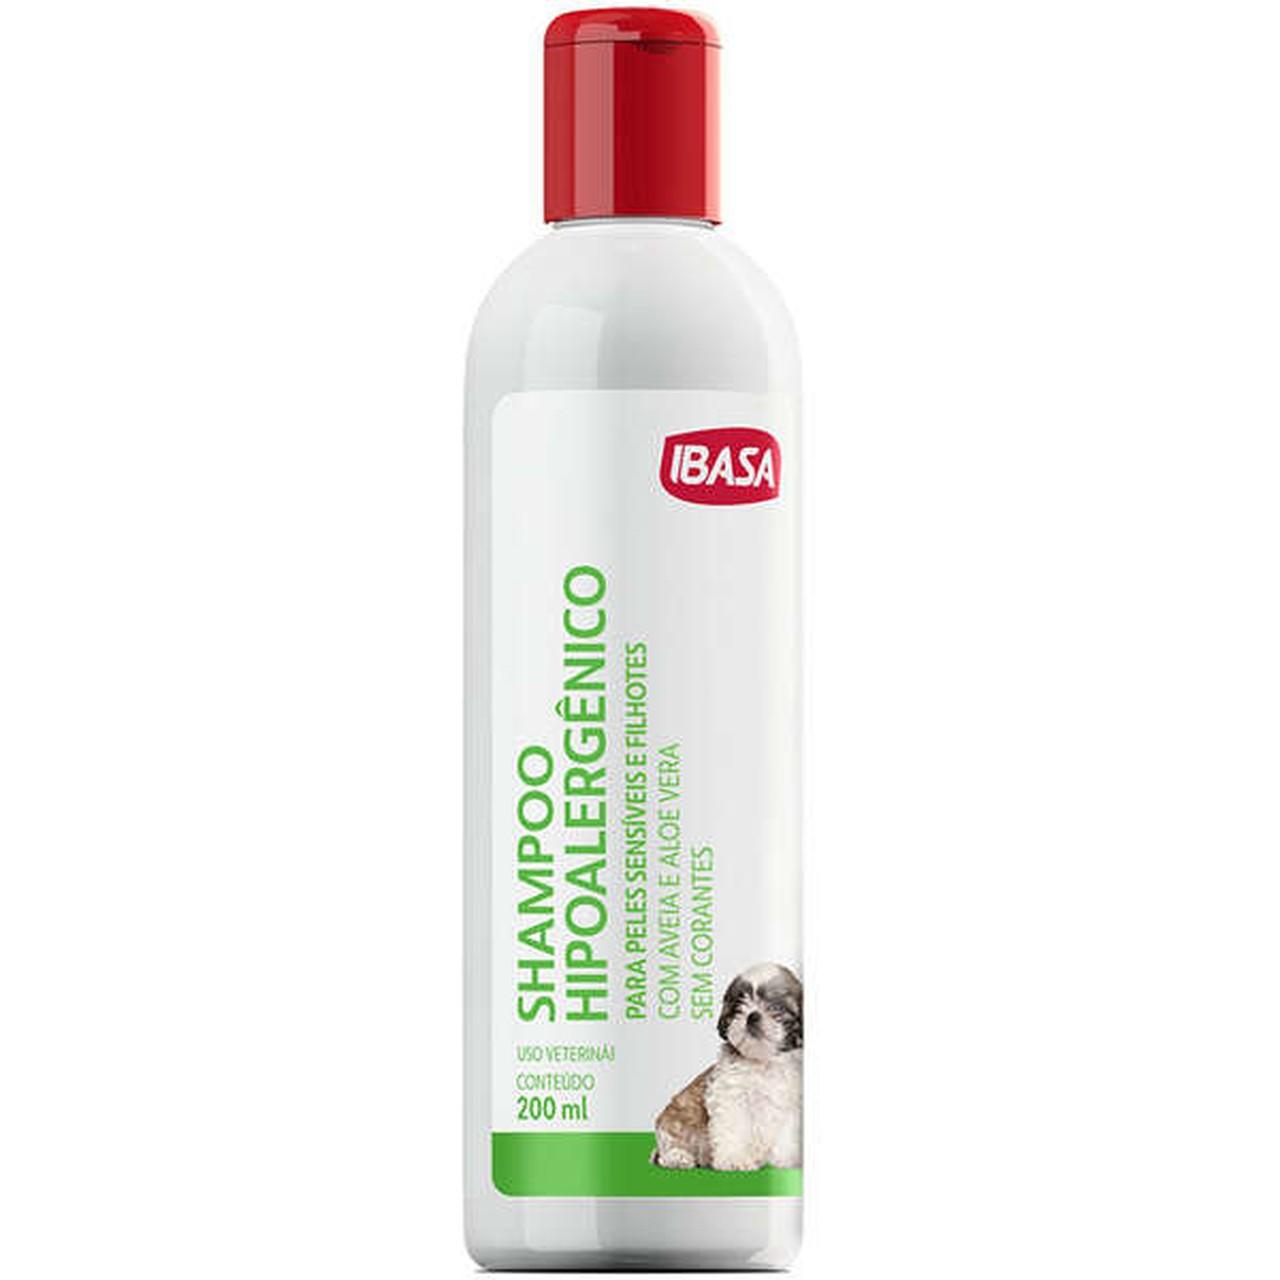 Shampoo Ibasa Hipoalergenico